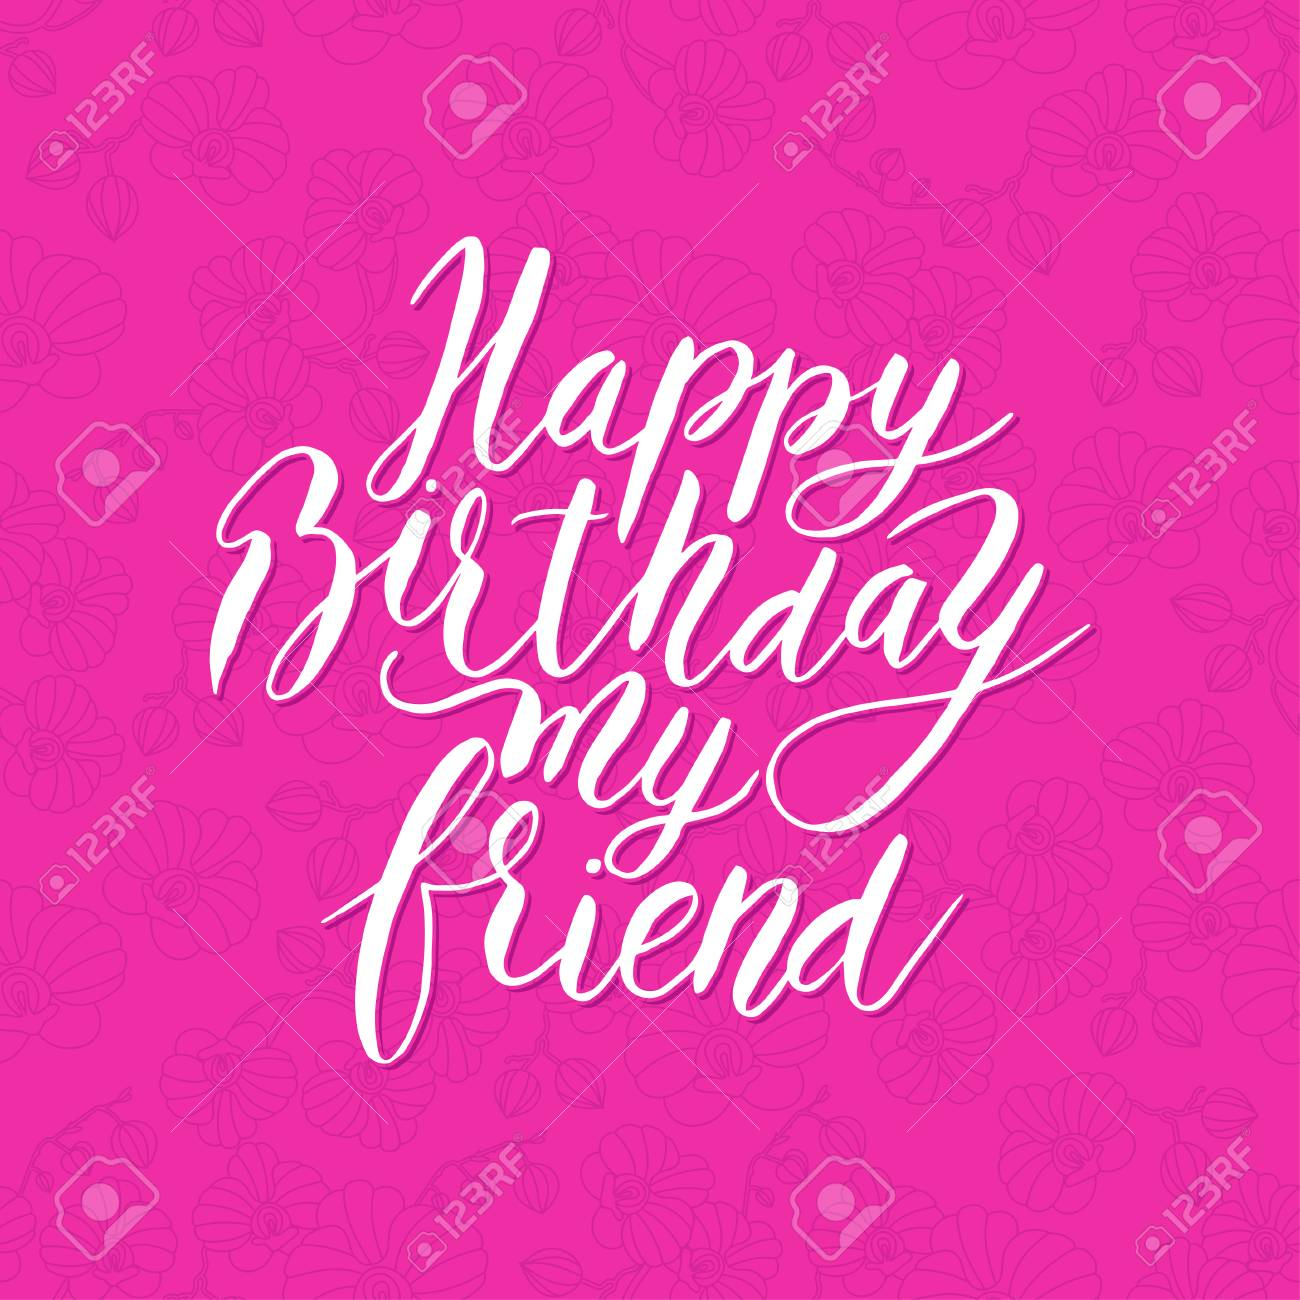 Image of: Boyfriend Happy Birthday Friend Congratulating Hand Drawn Quote Stock Vector 81955402 Happy Birthday Friend Congratulating Hand Drawn Quote Royalty Free